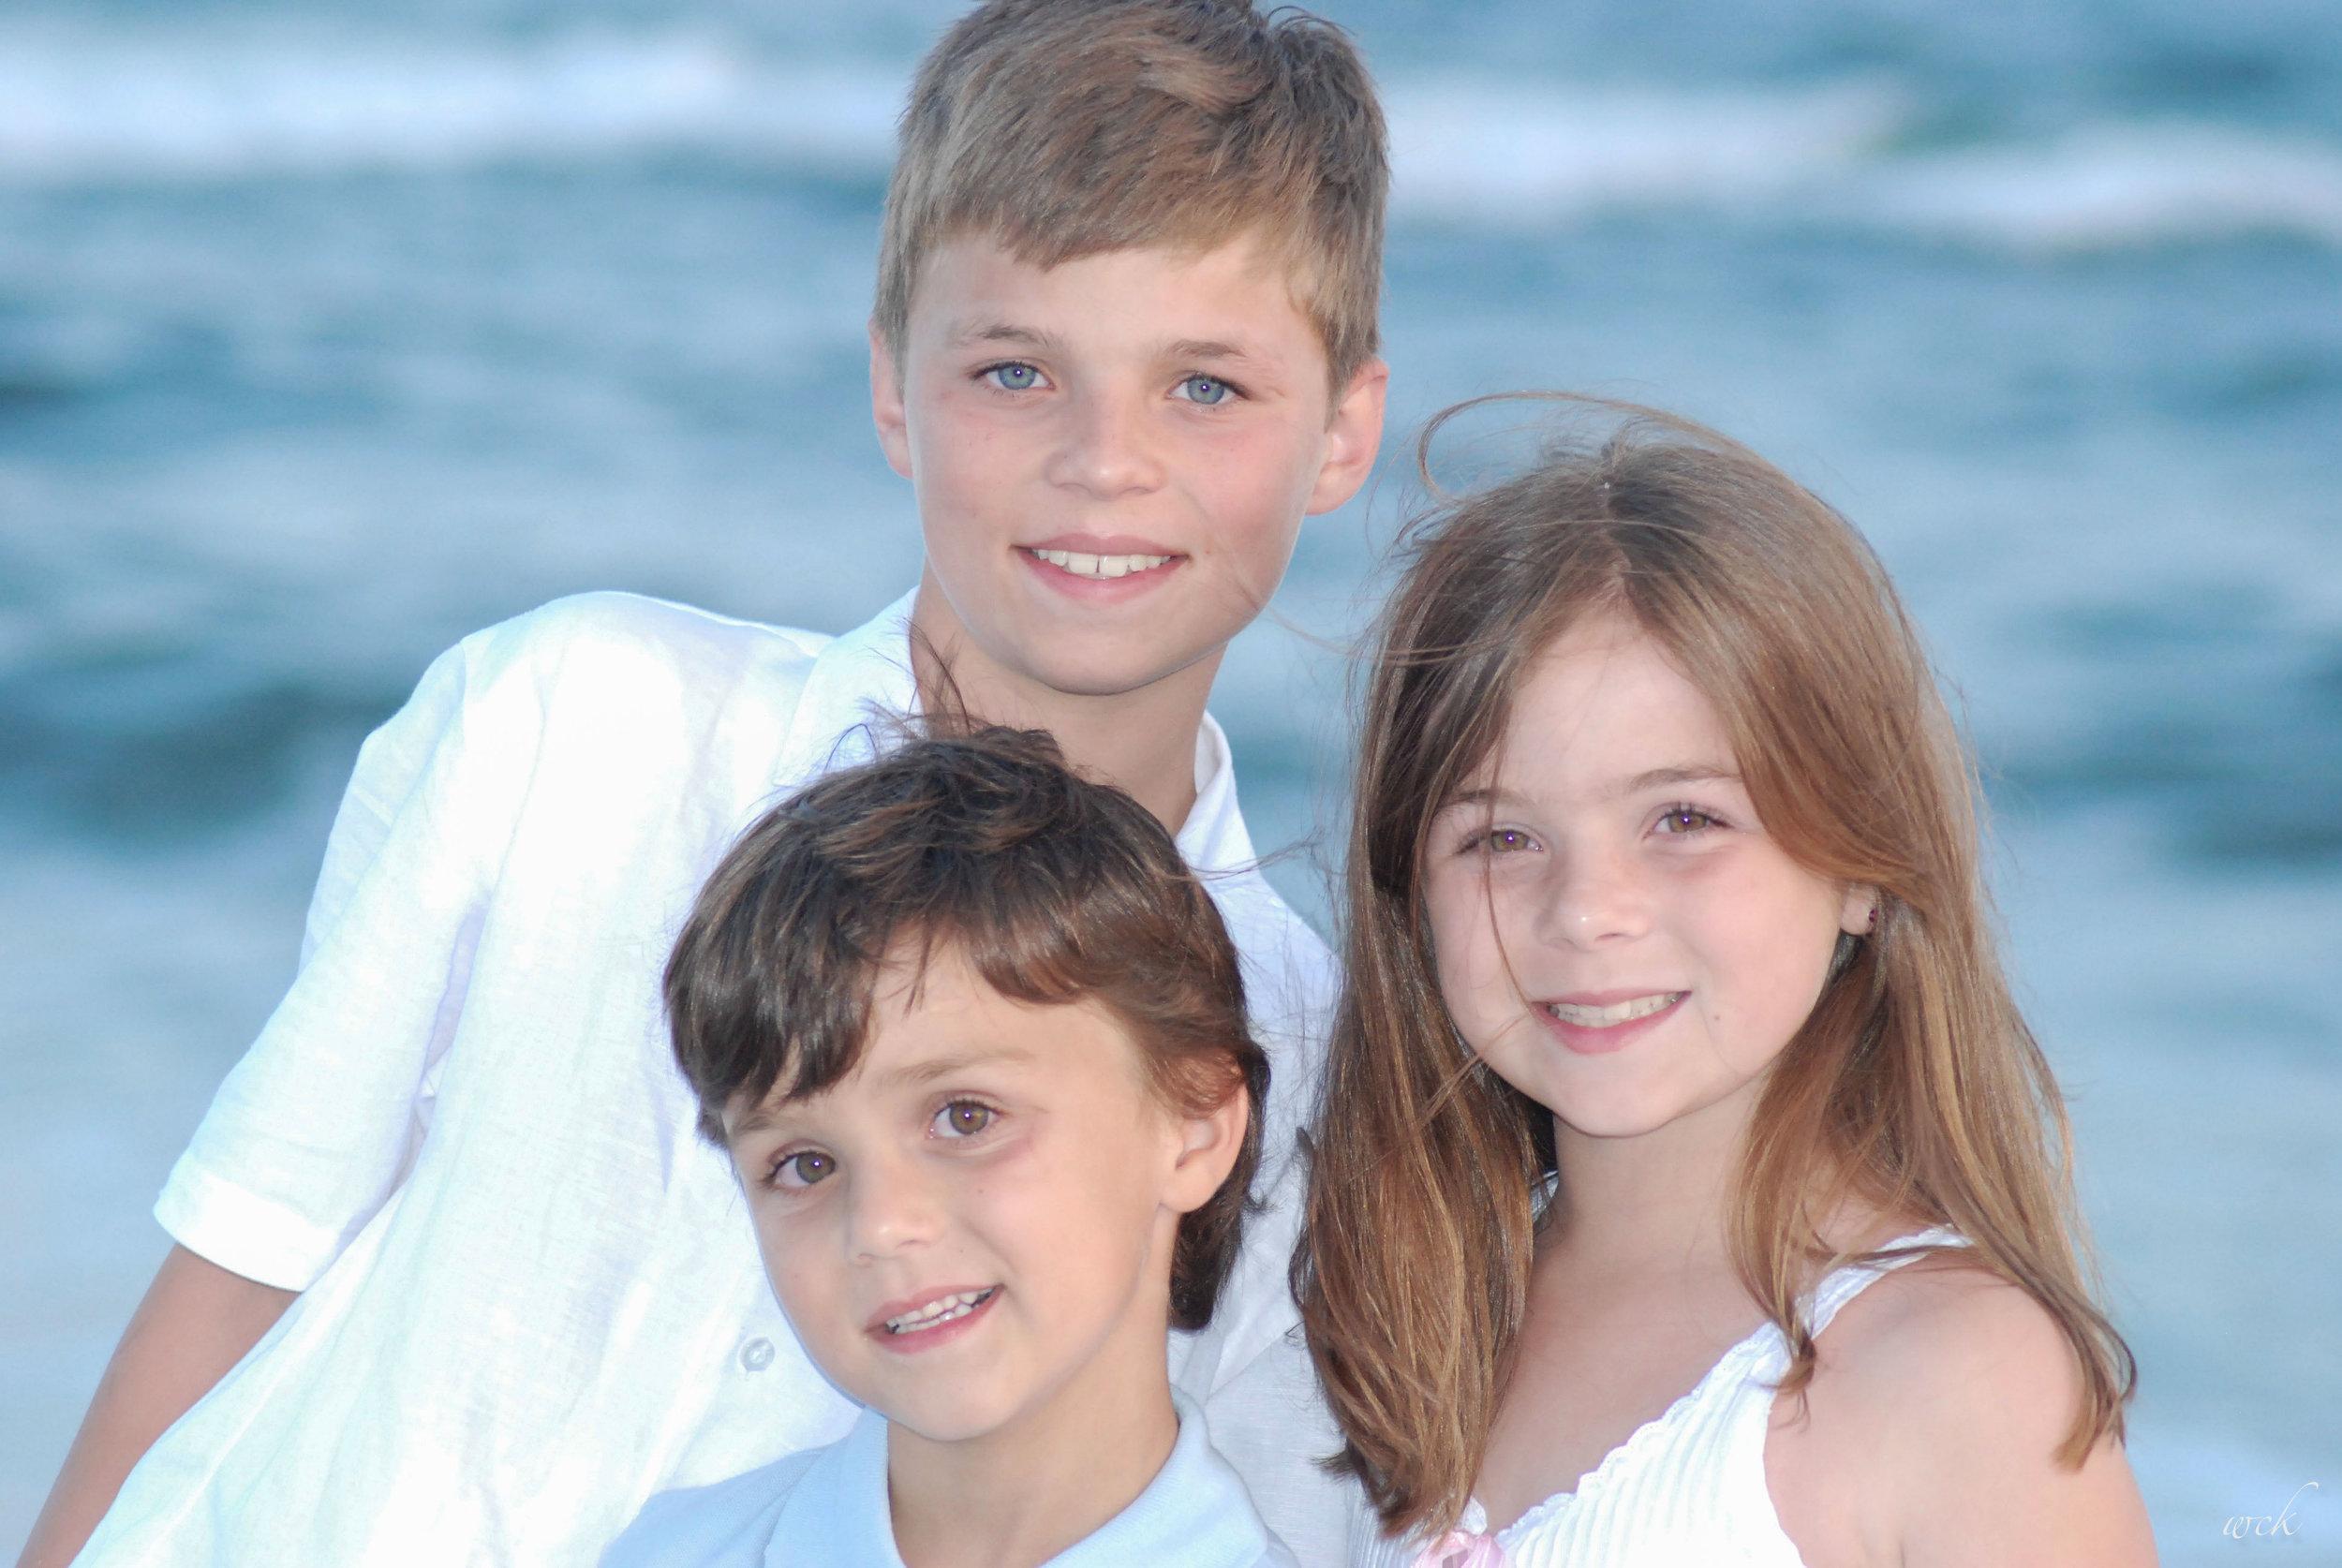 05 28 07 Kesler Beach Portraits 068 Top 100 - web.jpg